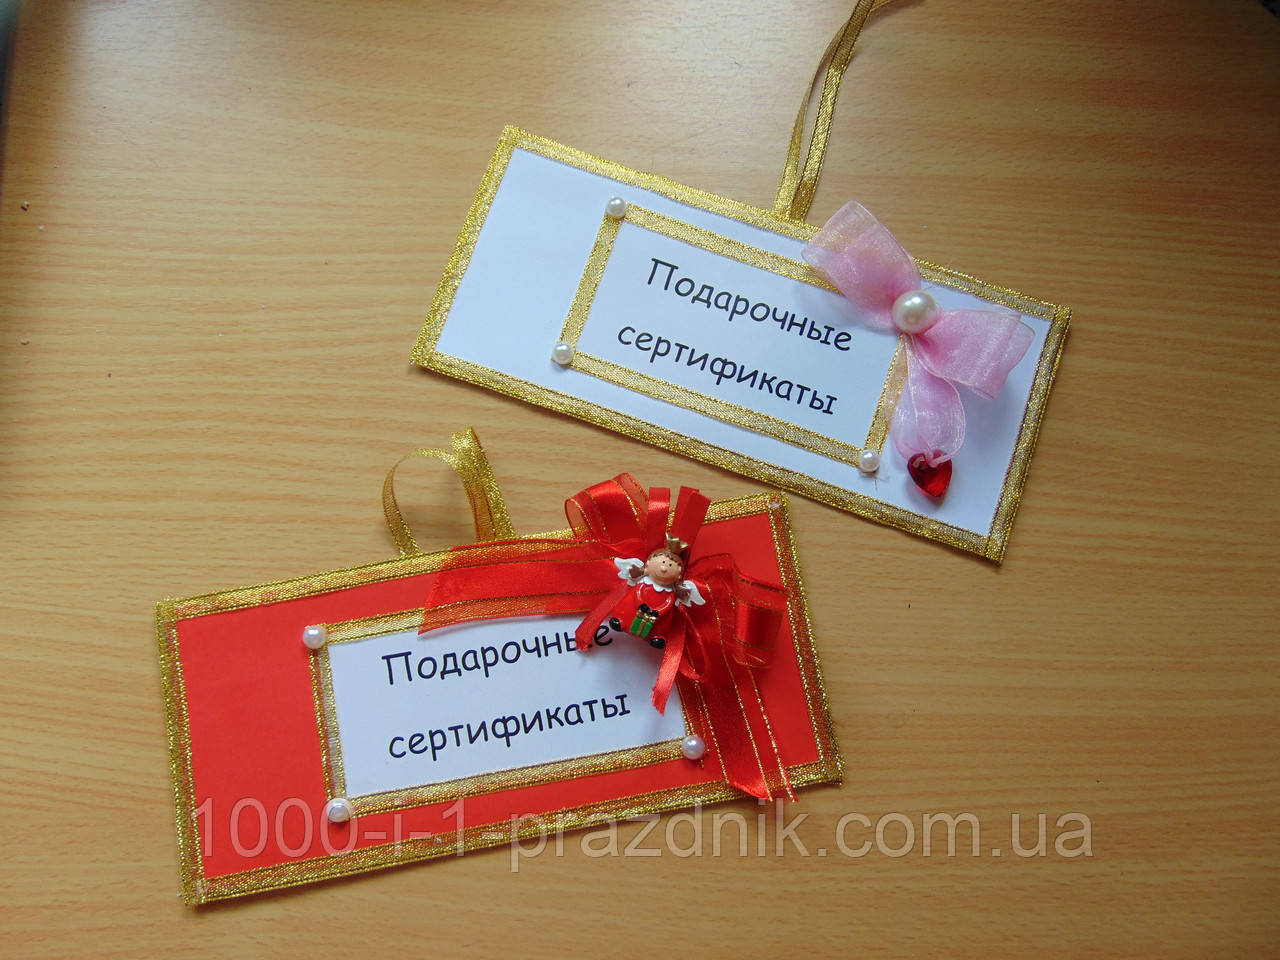 Сертификат на желания для любимого своими руками фото